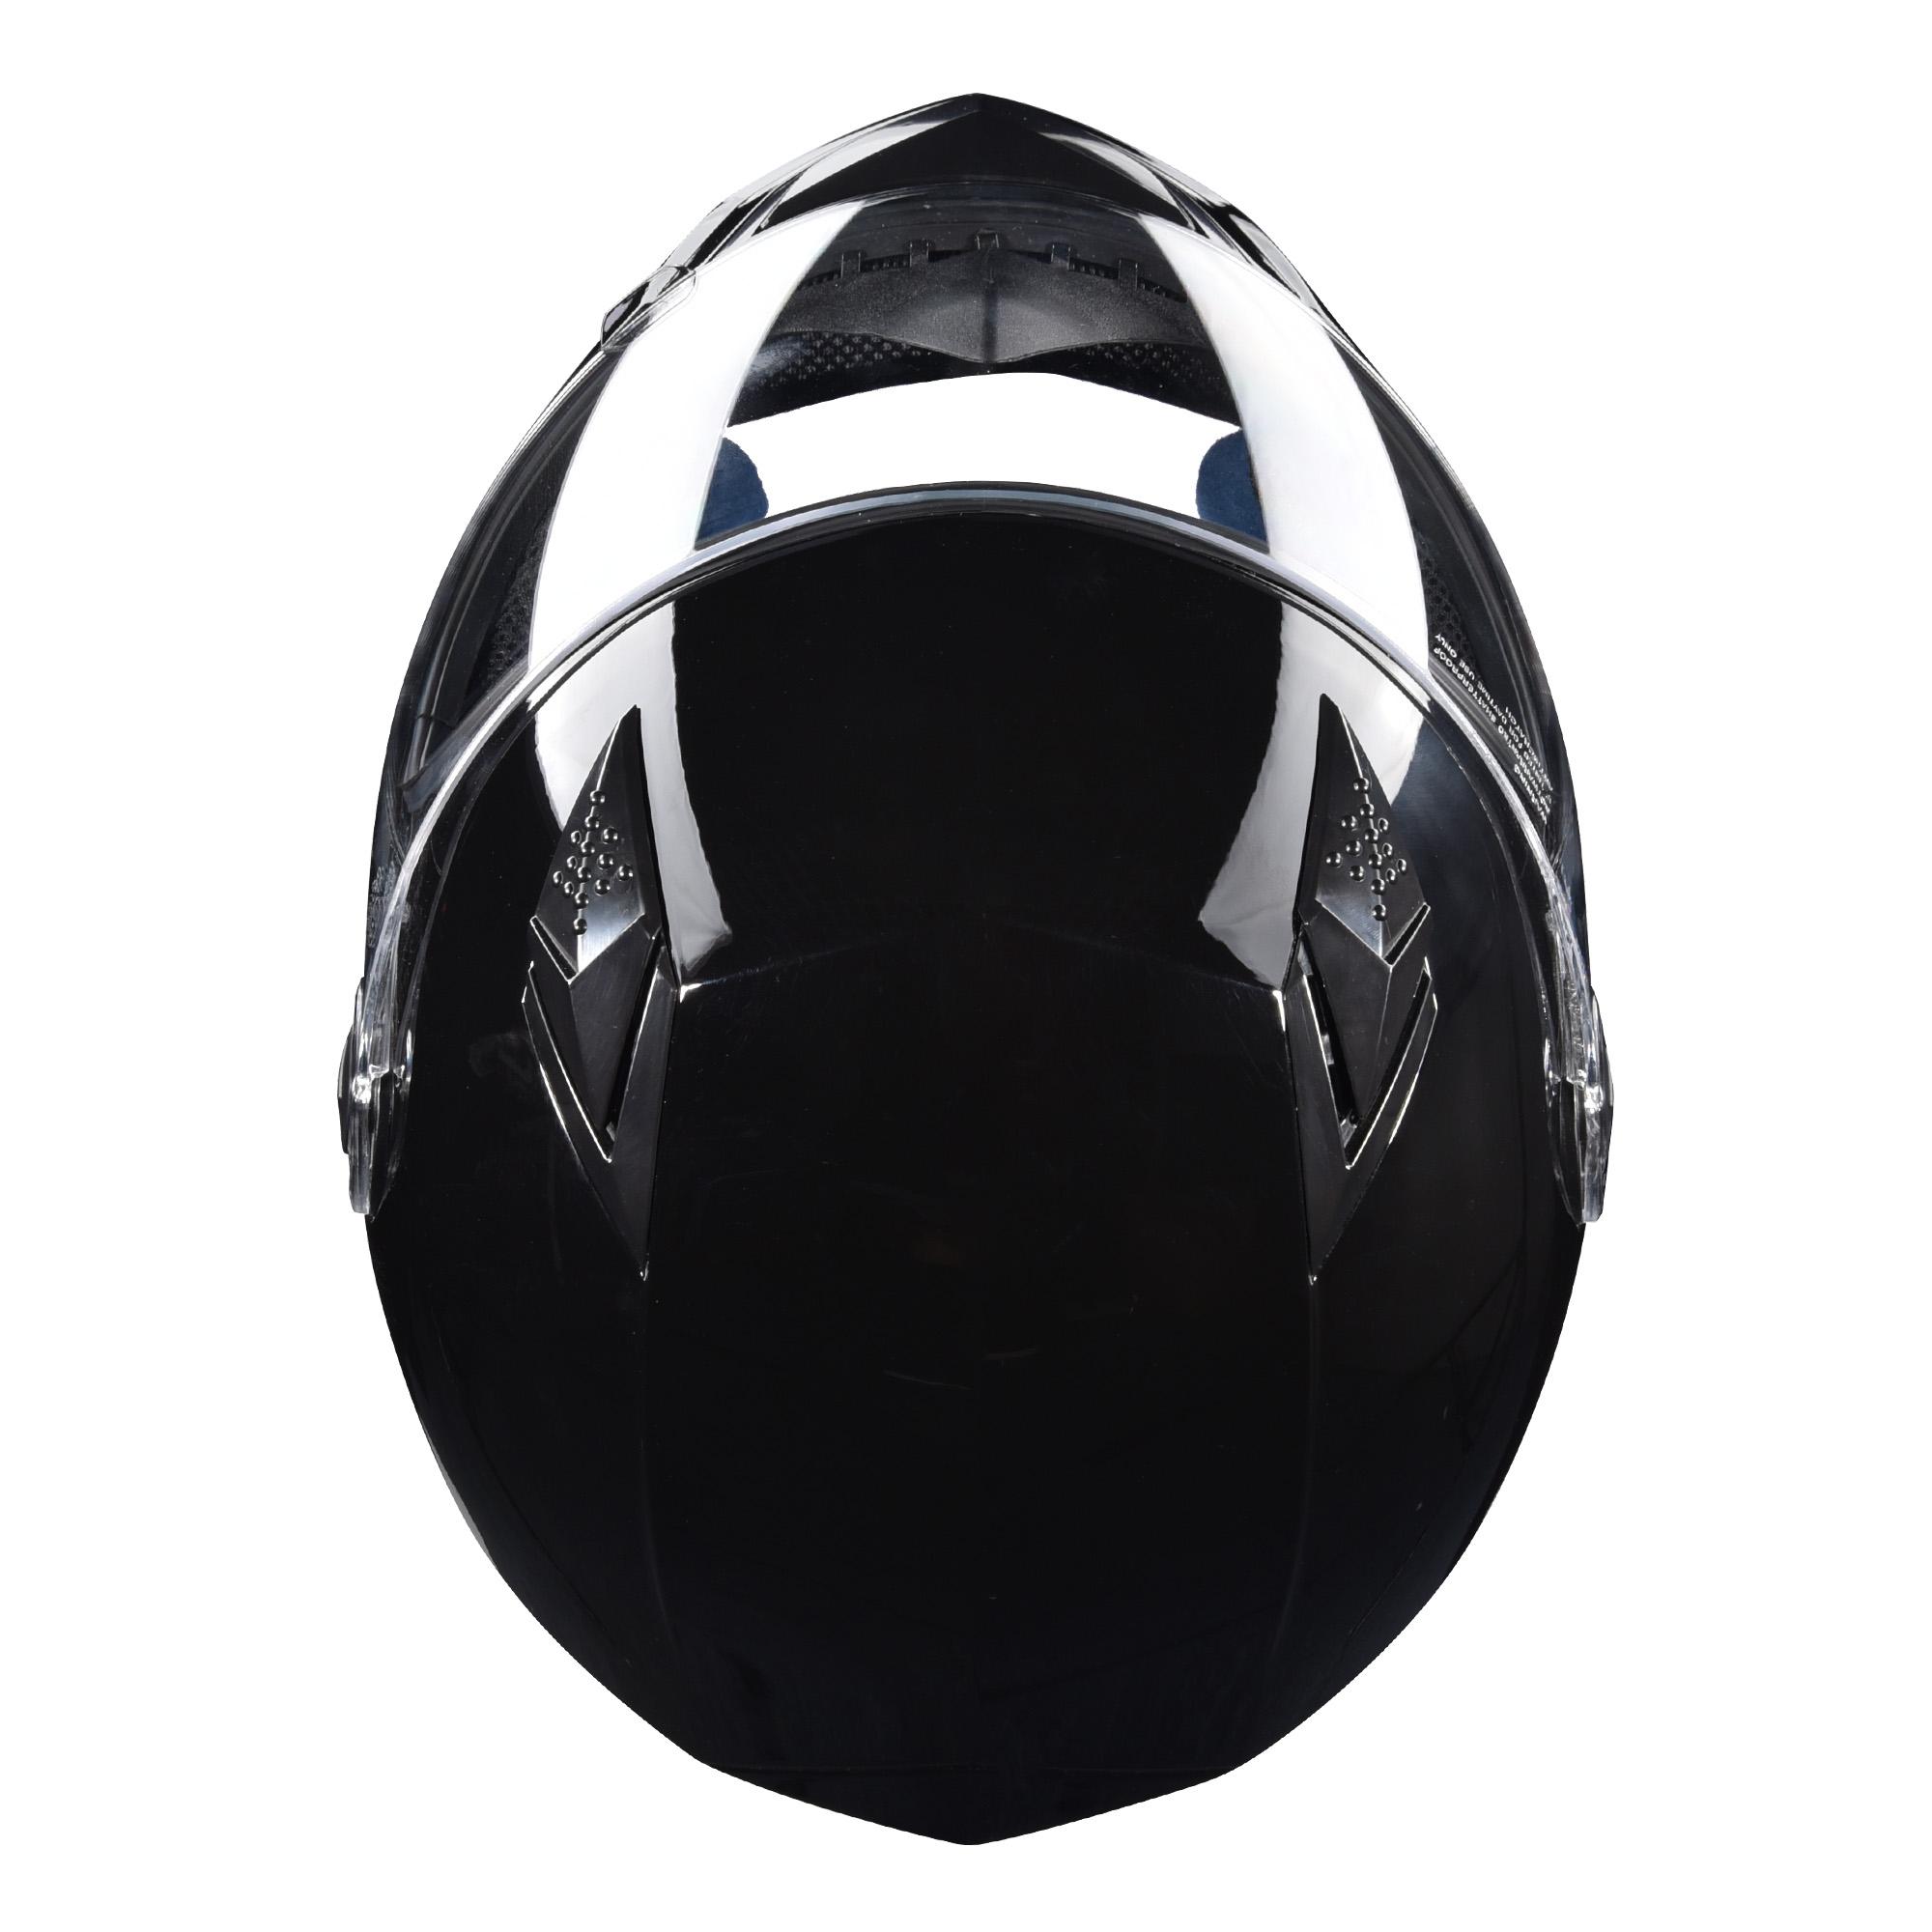 miniature 54 - AHR K12 Full Face Motorcycle Helmet DOT Air Vents Clear Visor Racing S M L XL